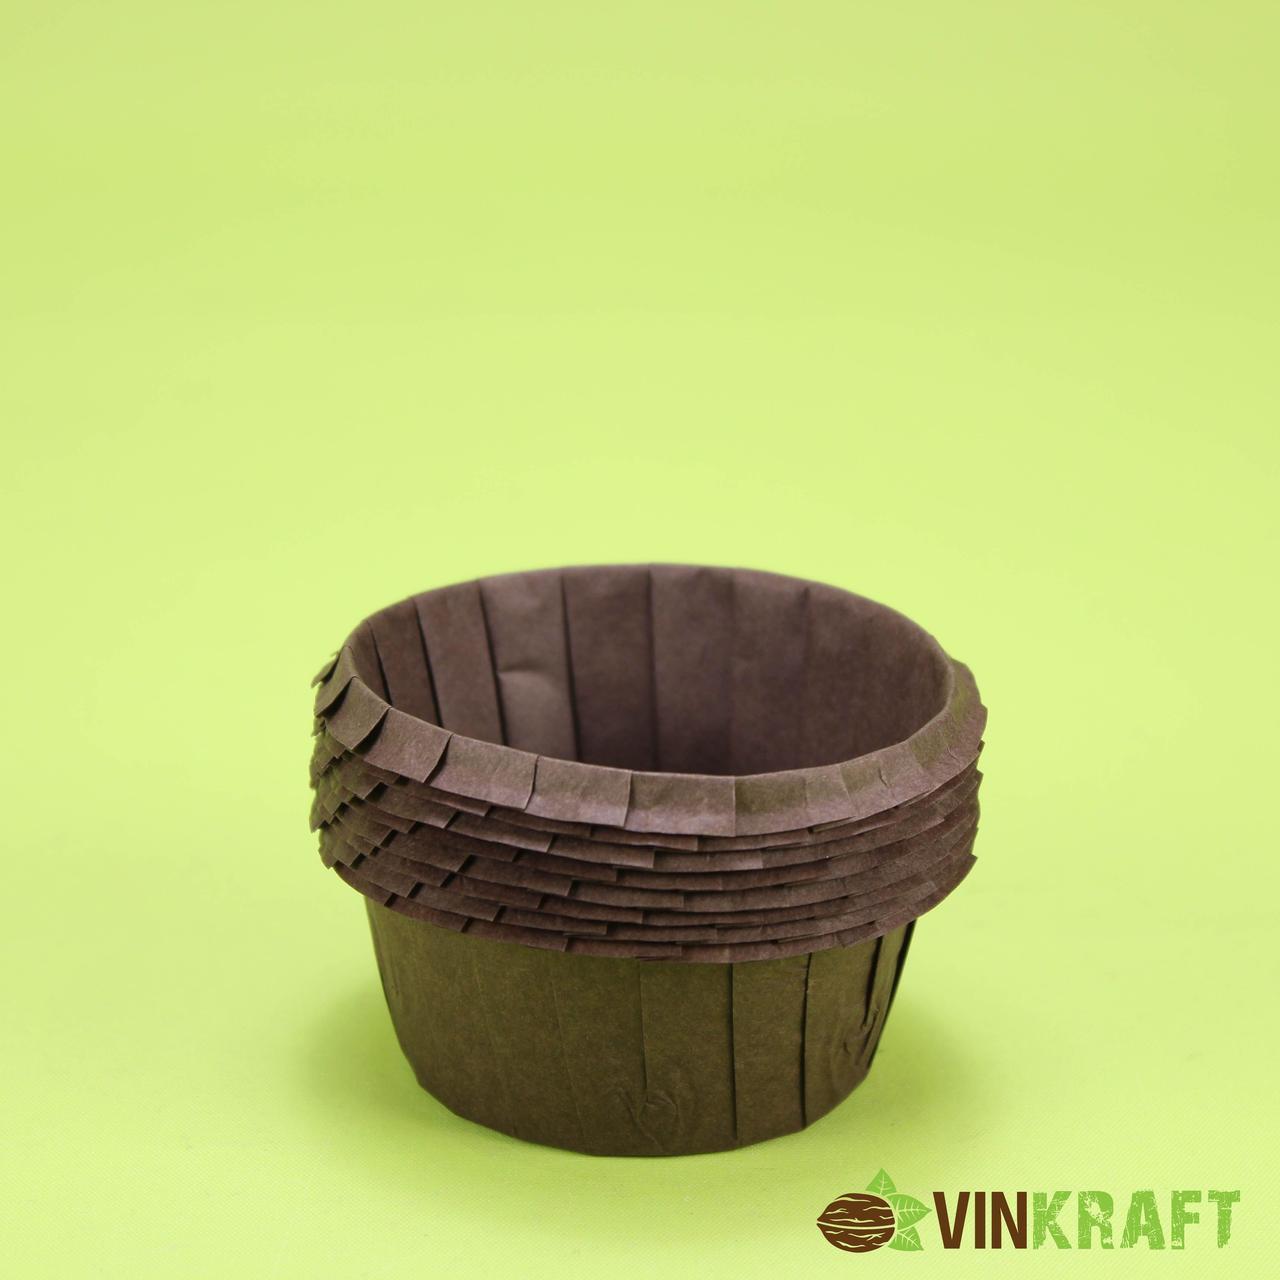 Паперова форма (55*35)  з посиленним бортиком для кексів, коричнева